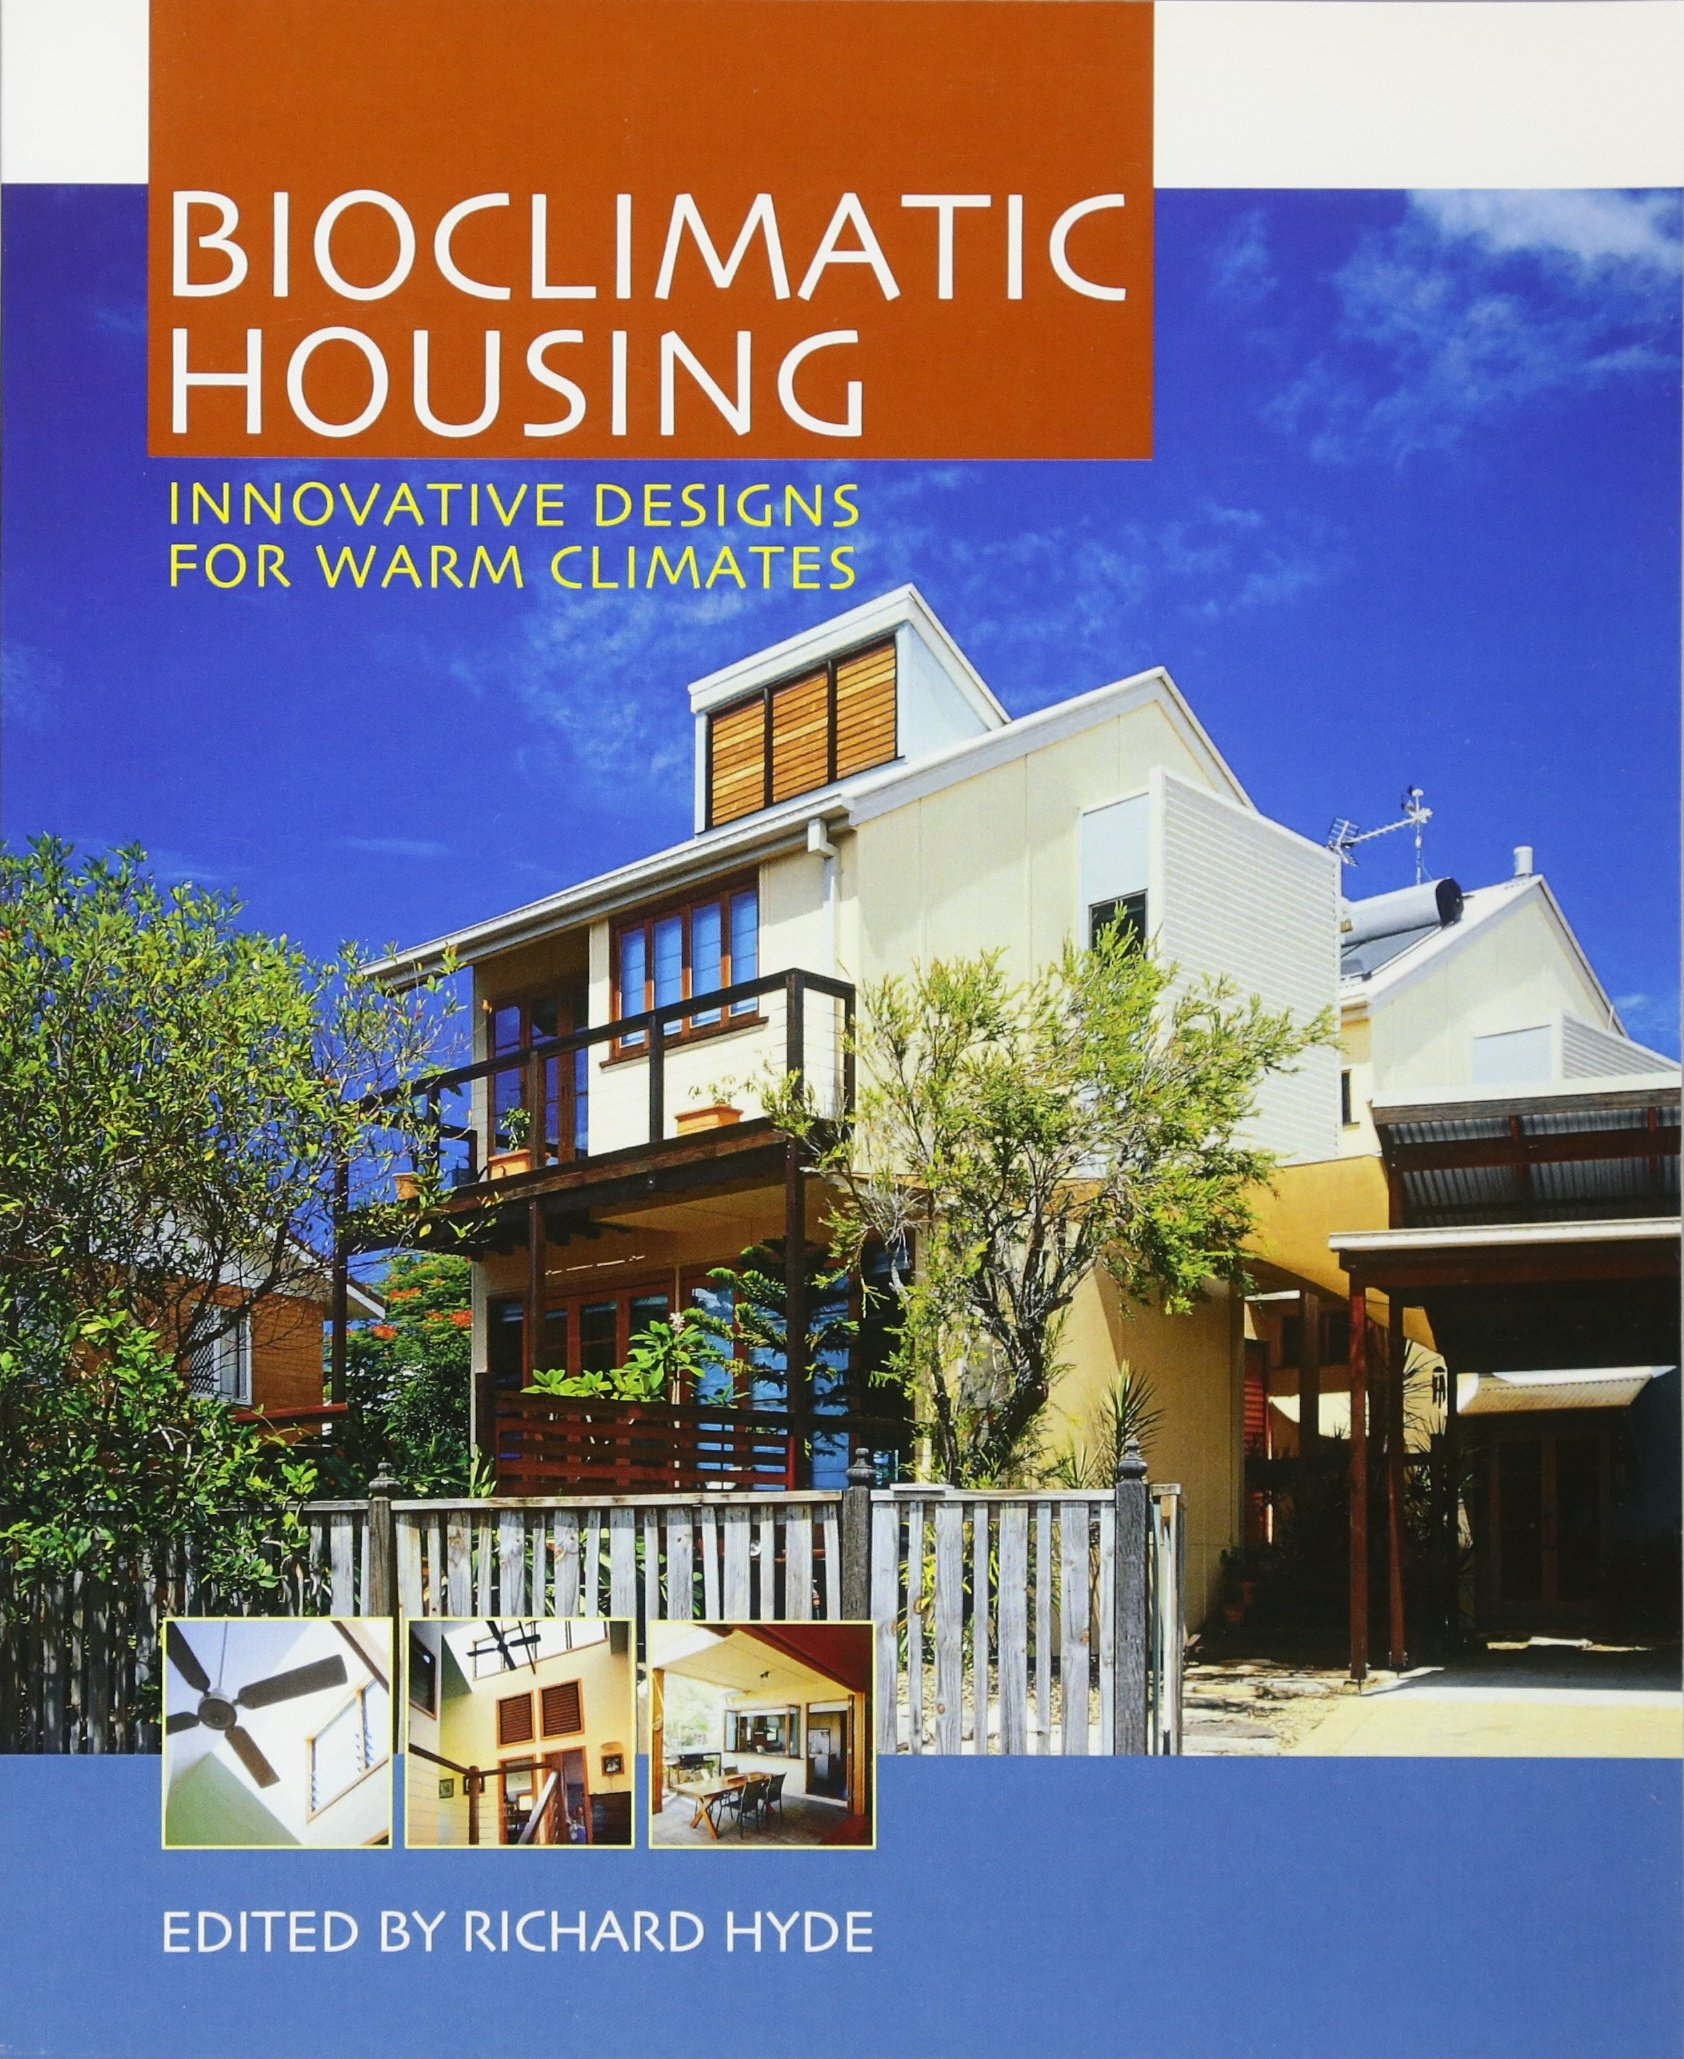 Bioclimatic Housing: Innovative Designs For Warm Climates Paperback U2013  December 13, 2007